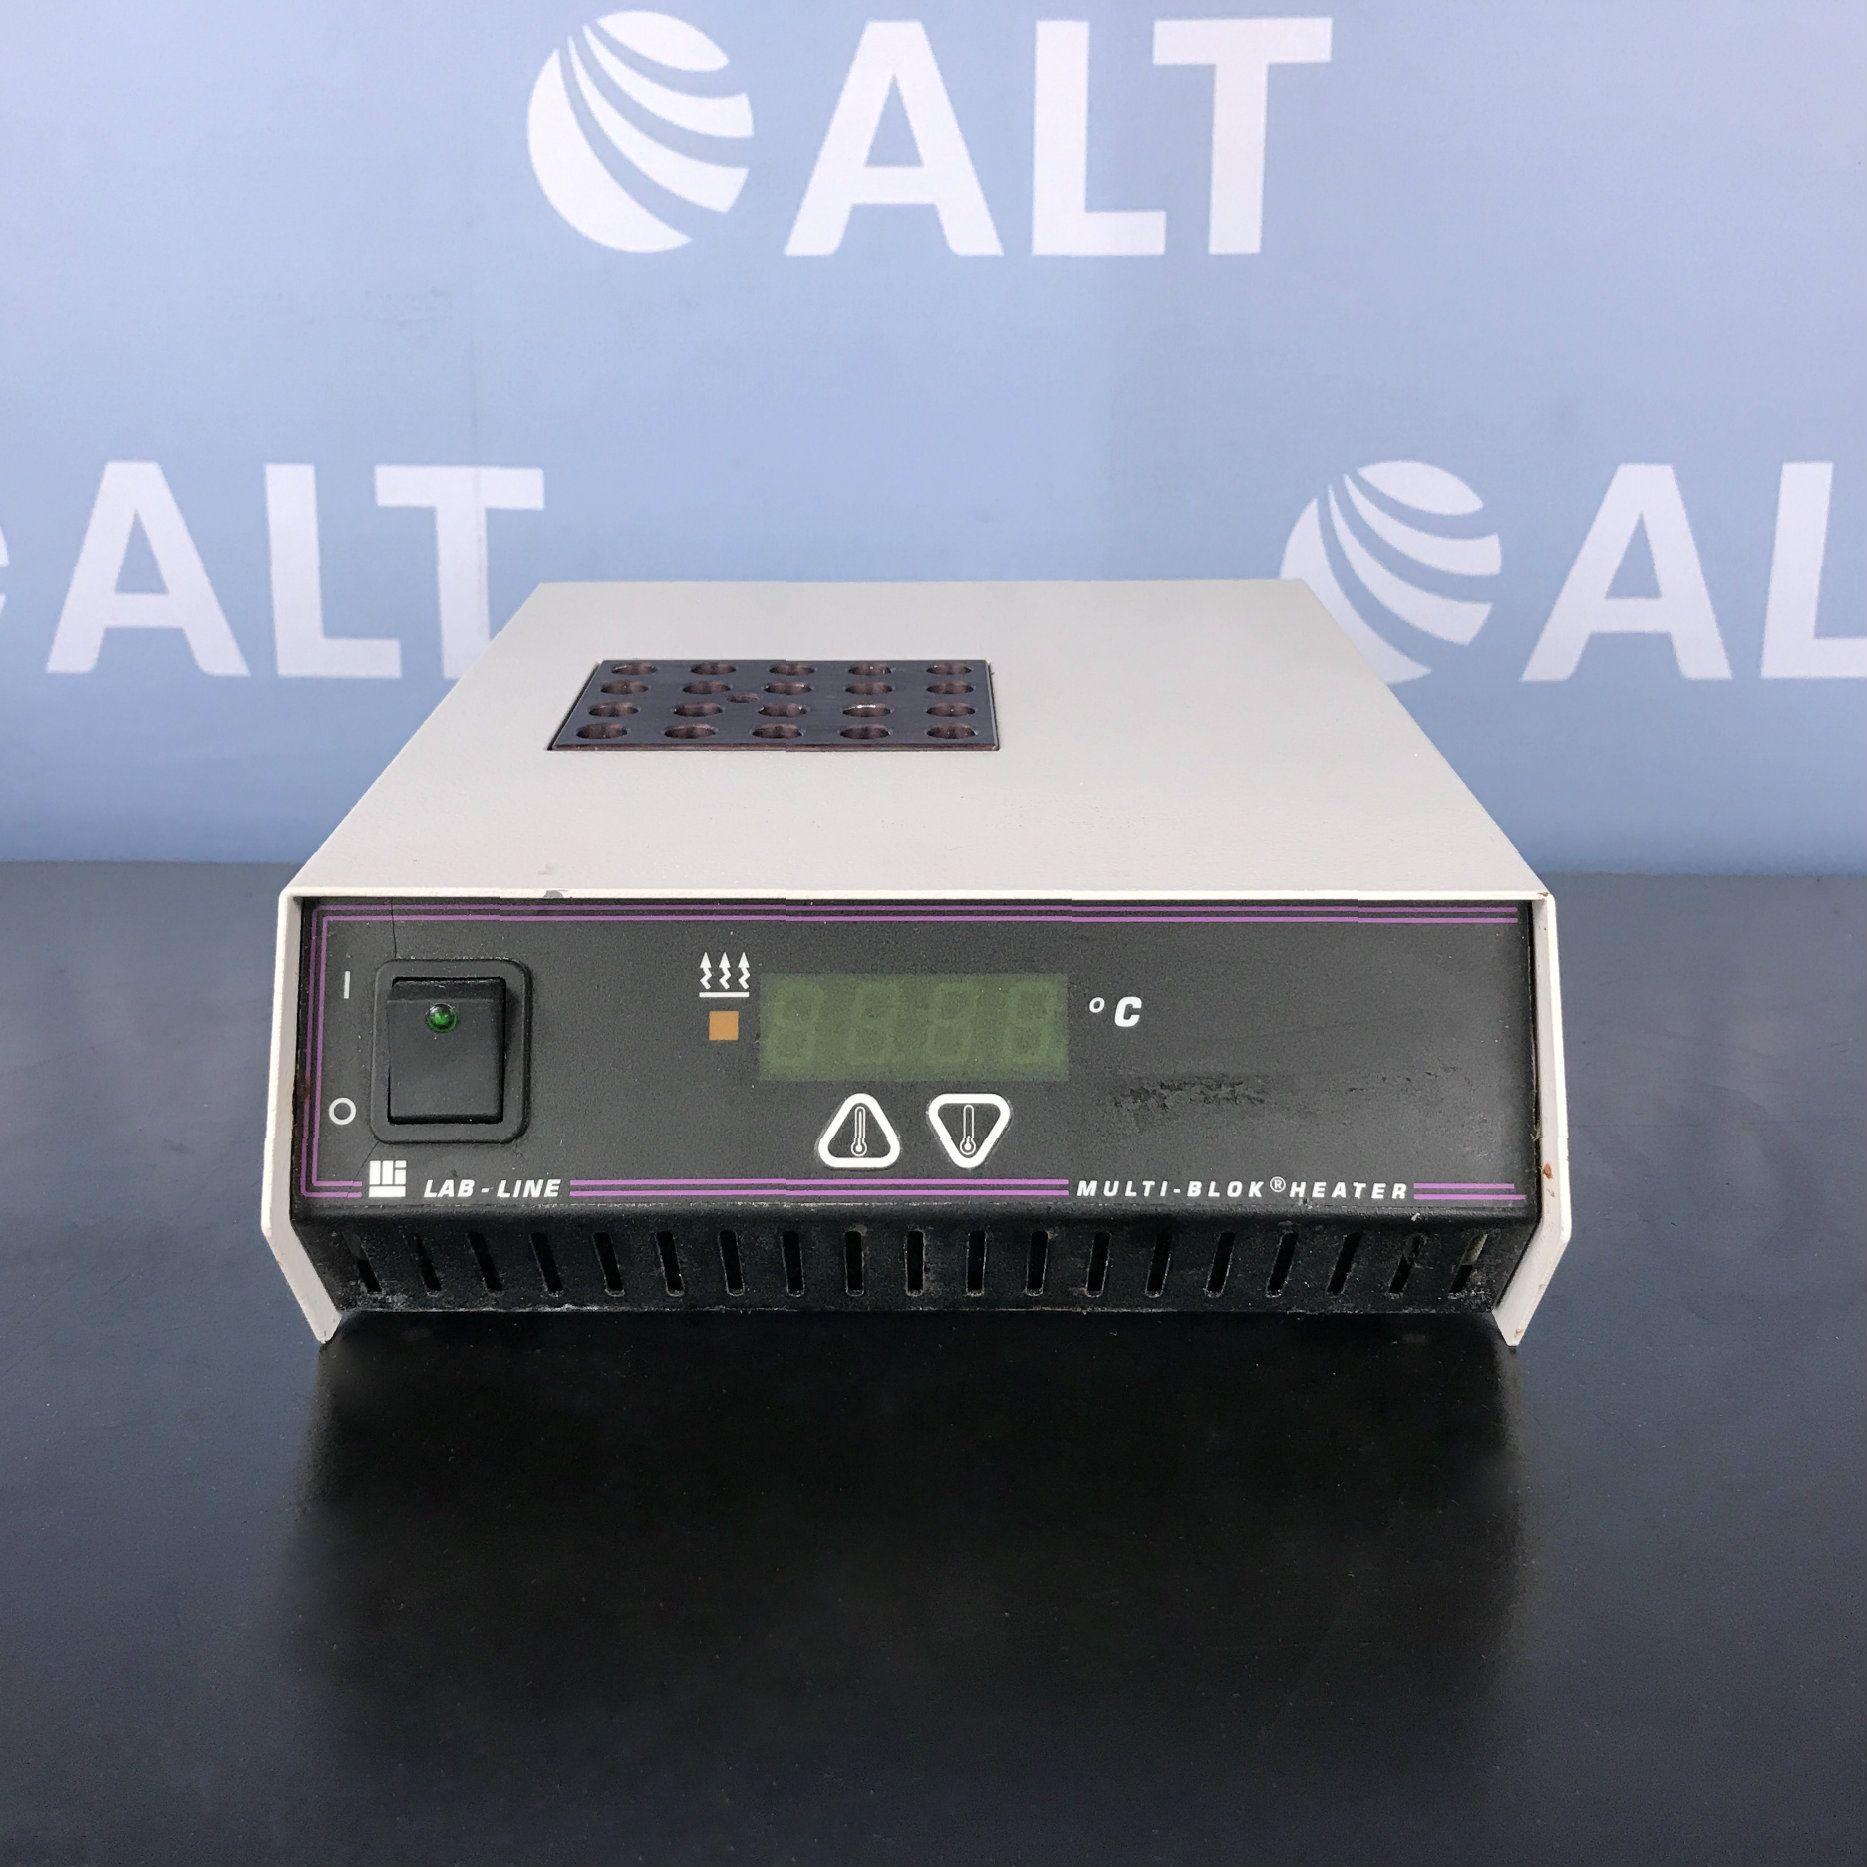 Lab-Line Multi-Blok Heater Model 2000